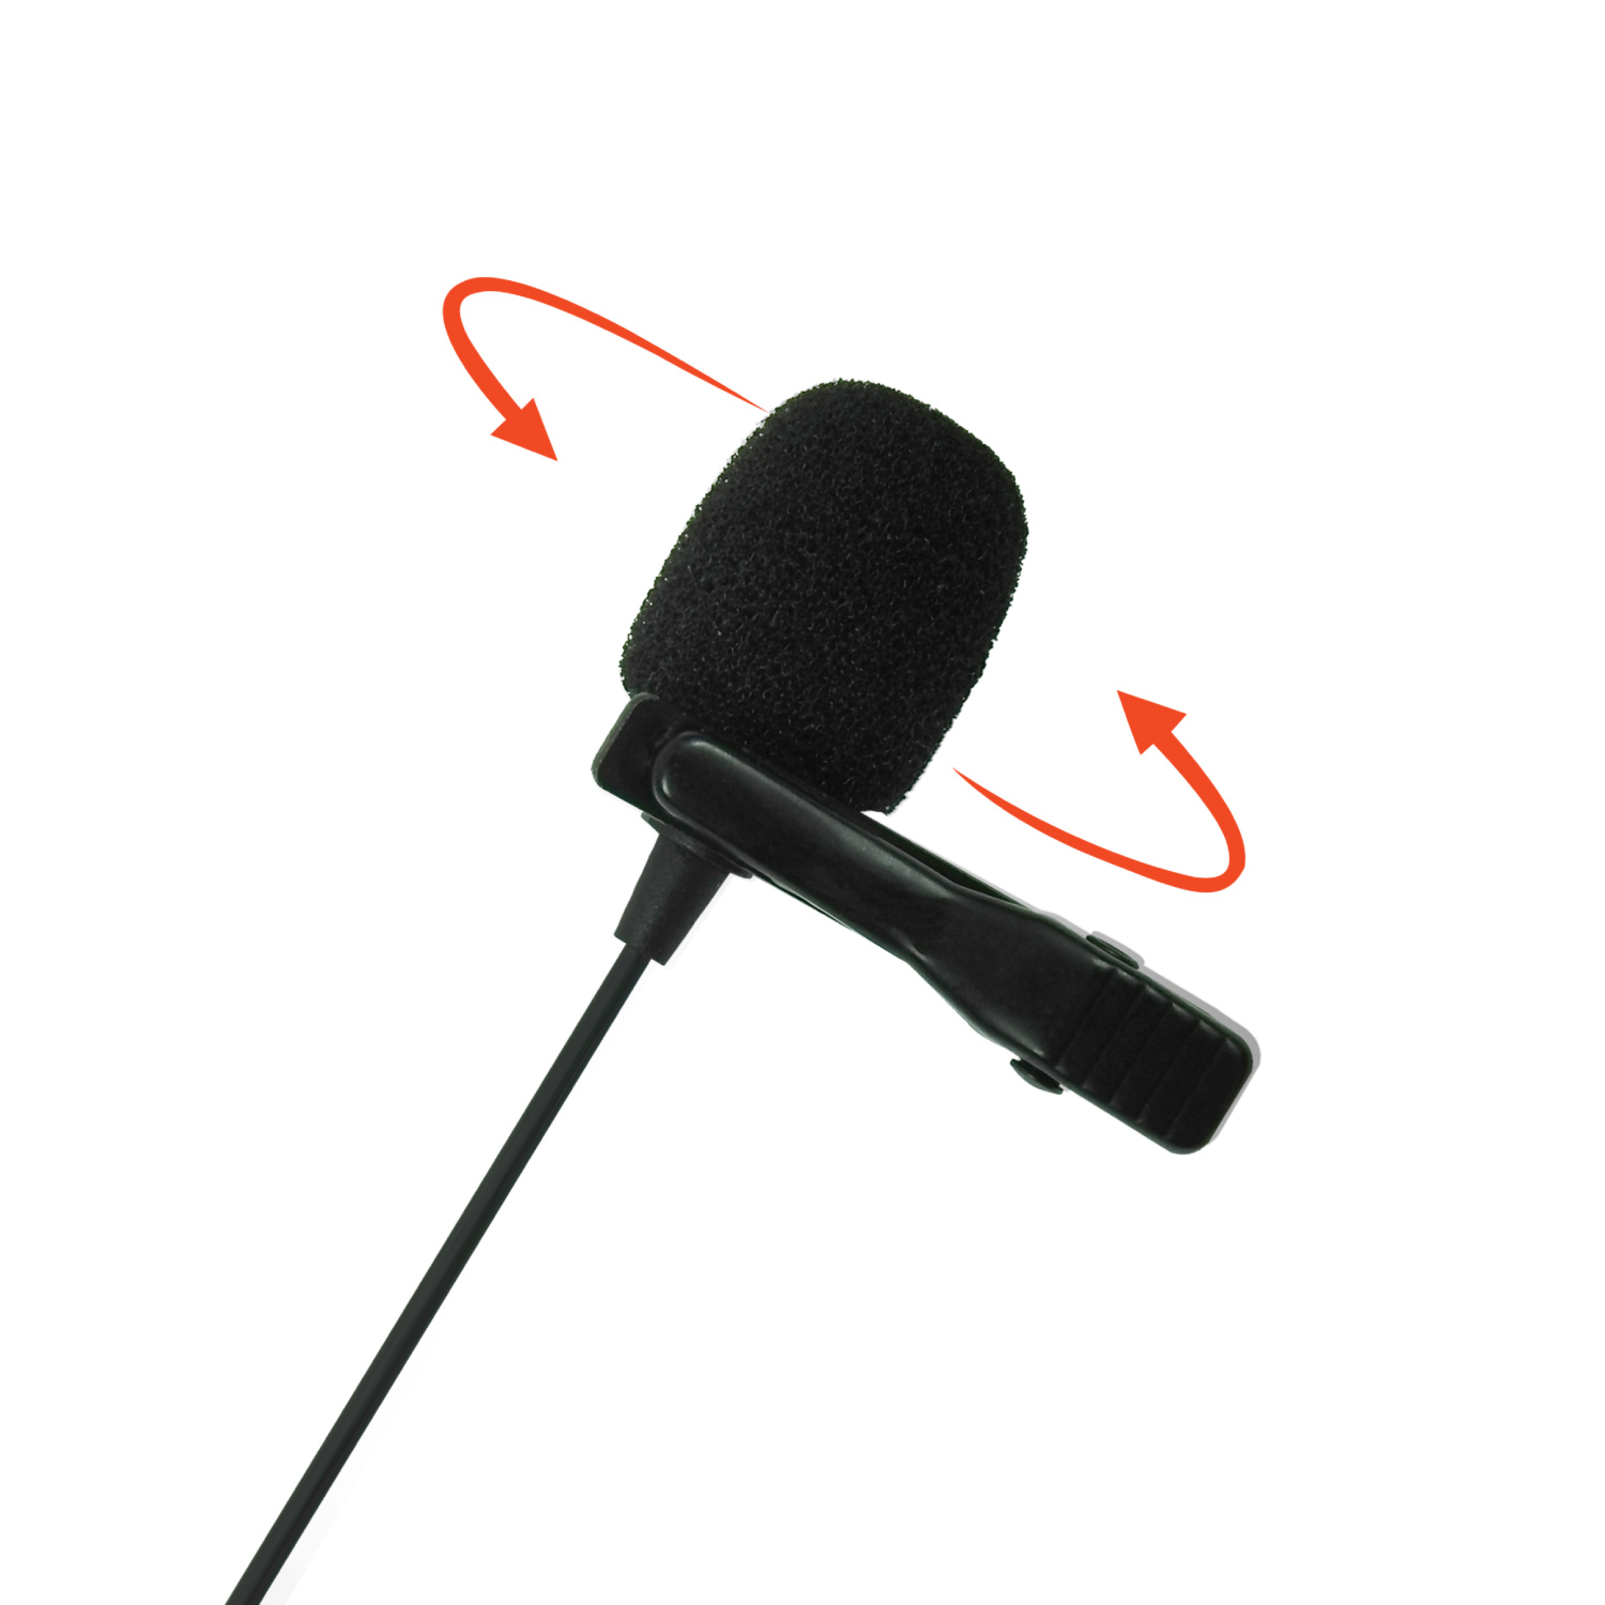 JBLCSLM20 - Black - Lavalier Microphone with Earphone - Detailshot 2